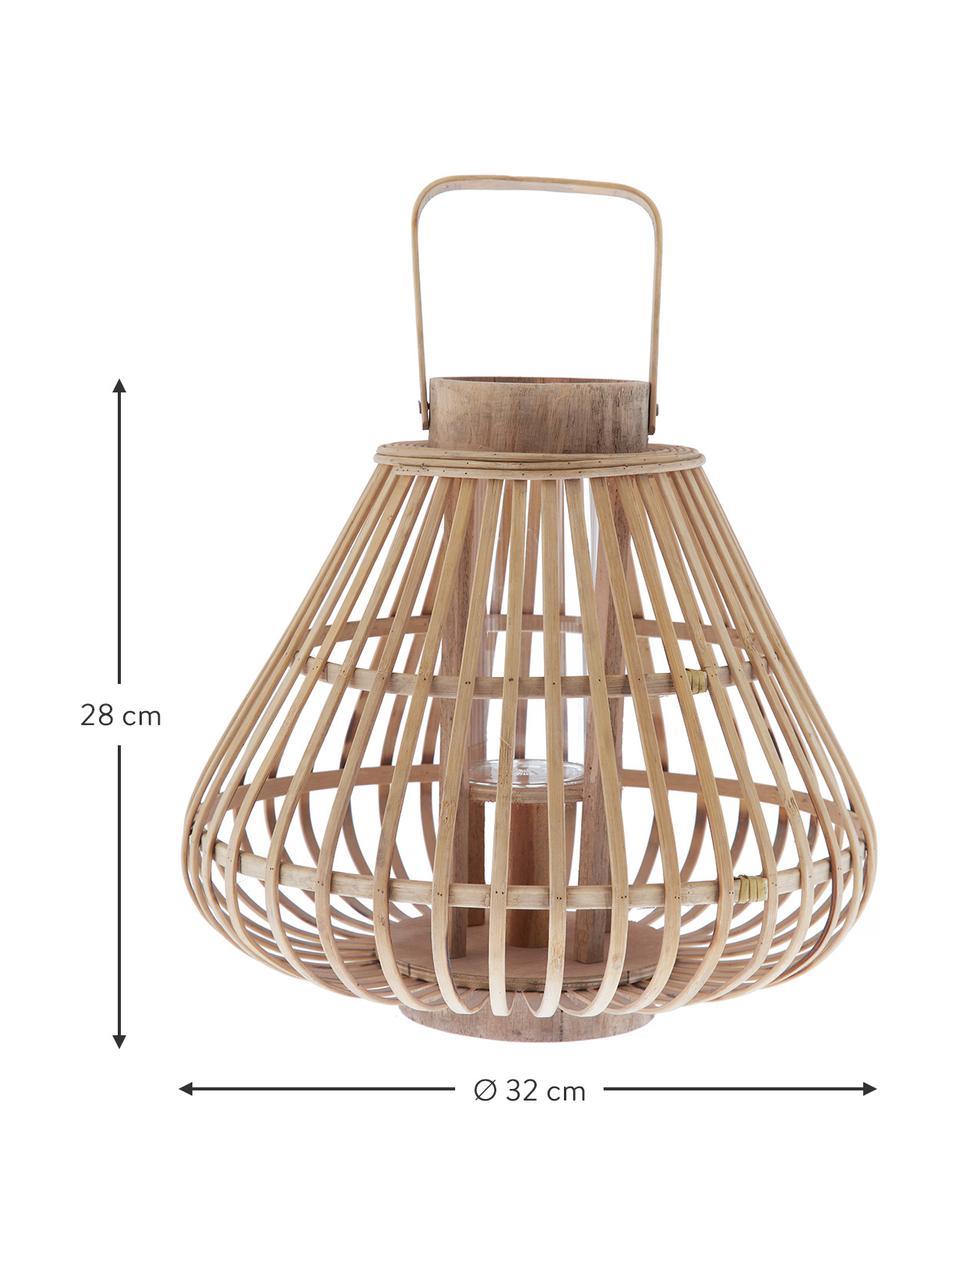 Laterne Sahara, Gehäuse: Bambus, Holz, Gehäuse: Bambus Glaseinsatz: Transparent, Ø 39 x H 33 cm